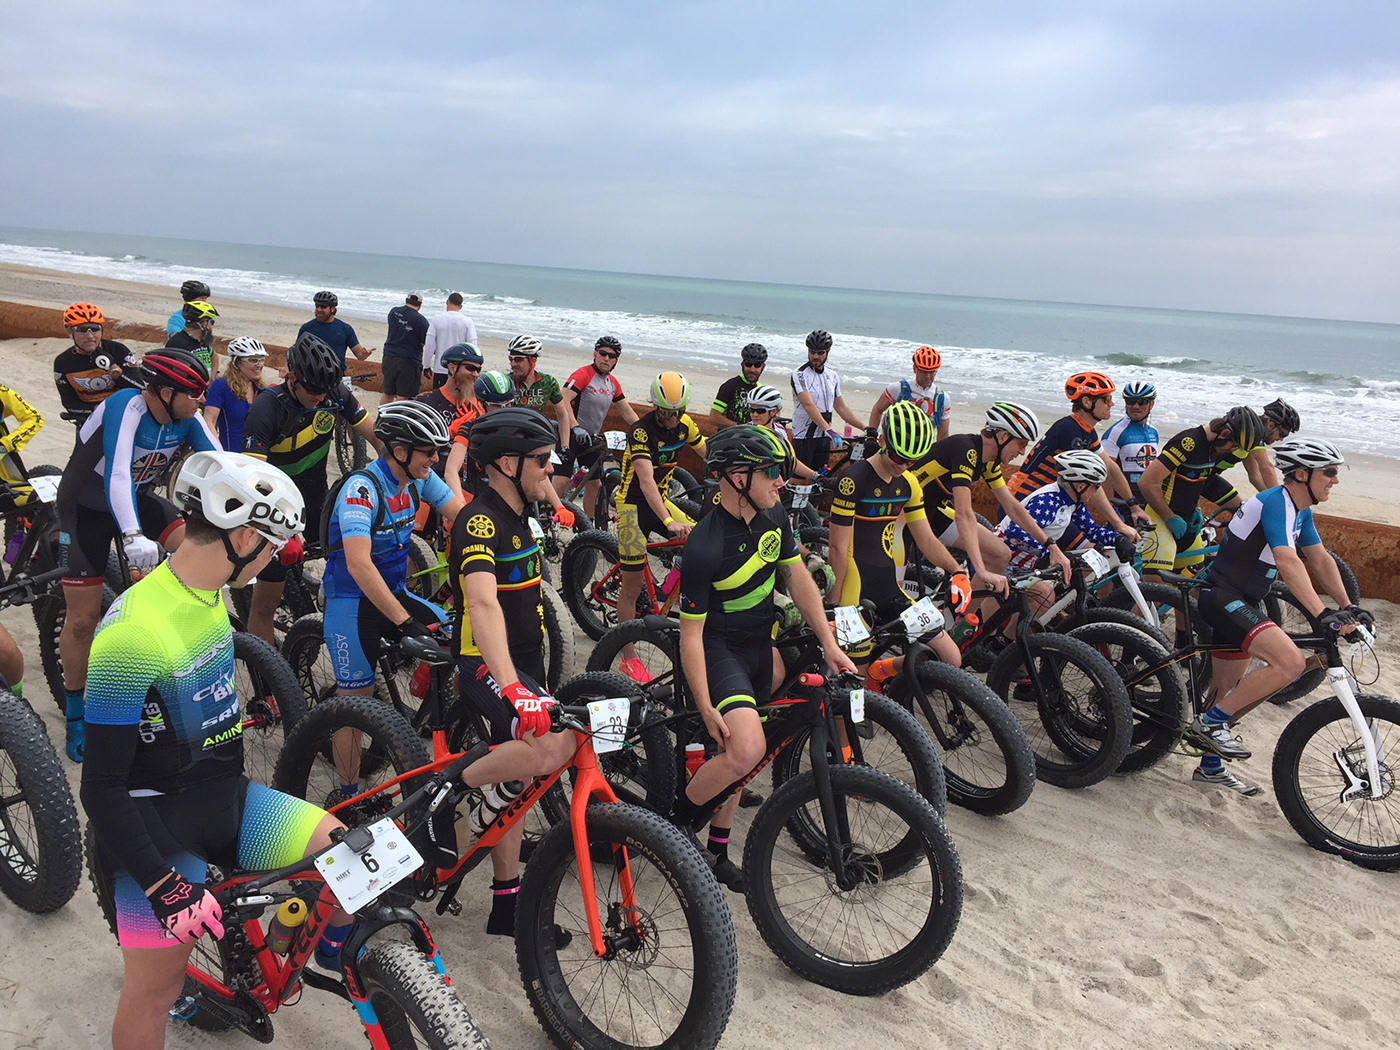 Fat Bike,biking,Cycling,Fat Tire,wrightsville beach,Blockade Runner ,Bike Cycles,Cyclocross,Philicia Marion,John Overton